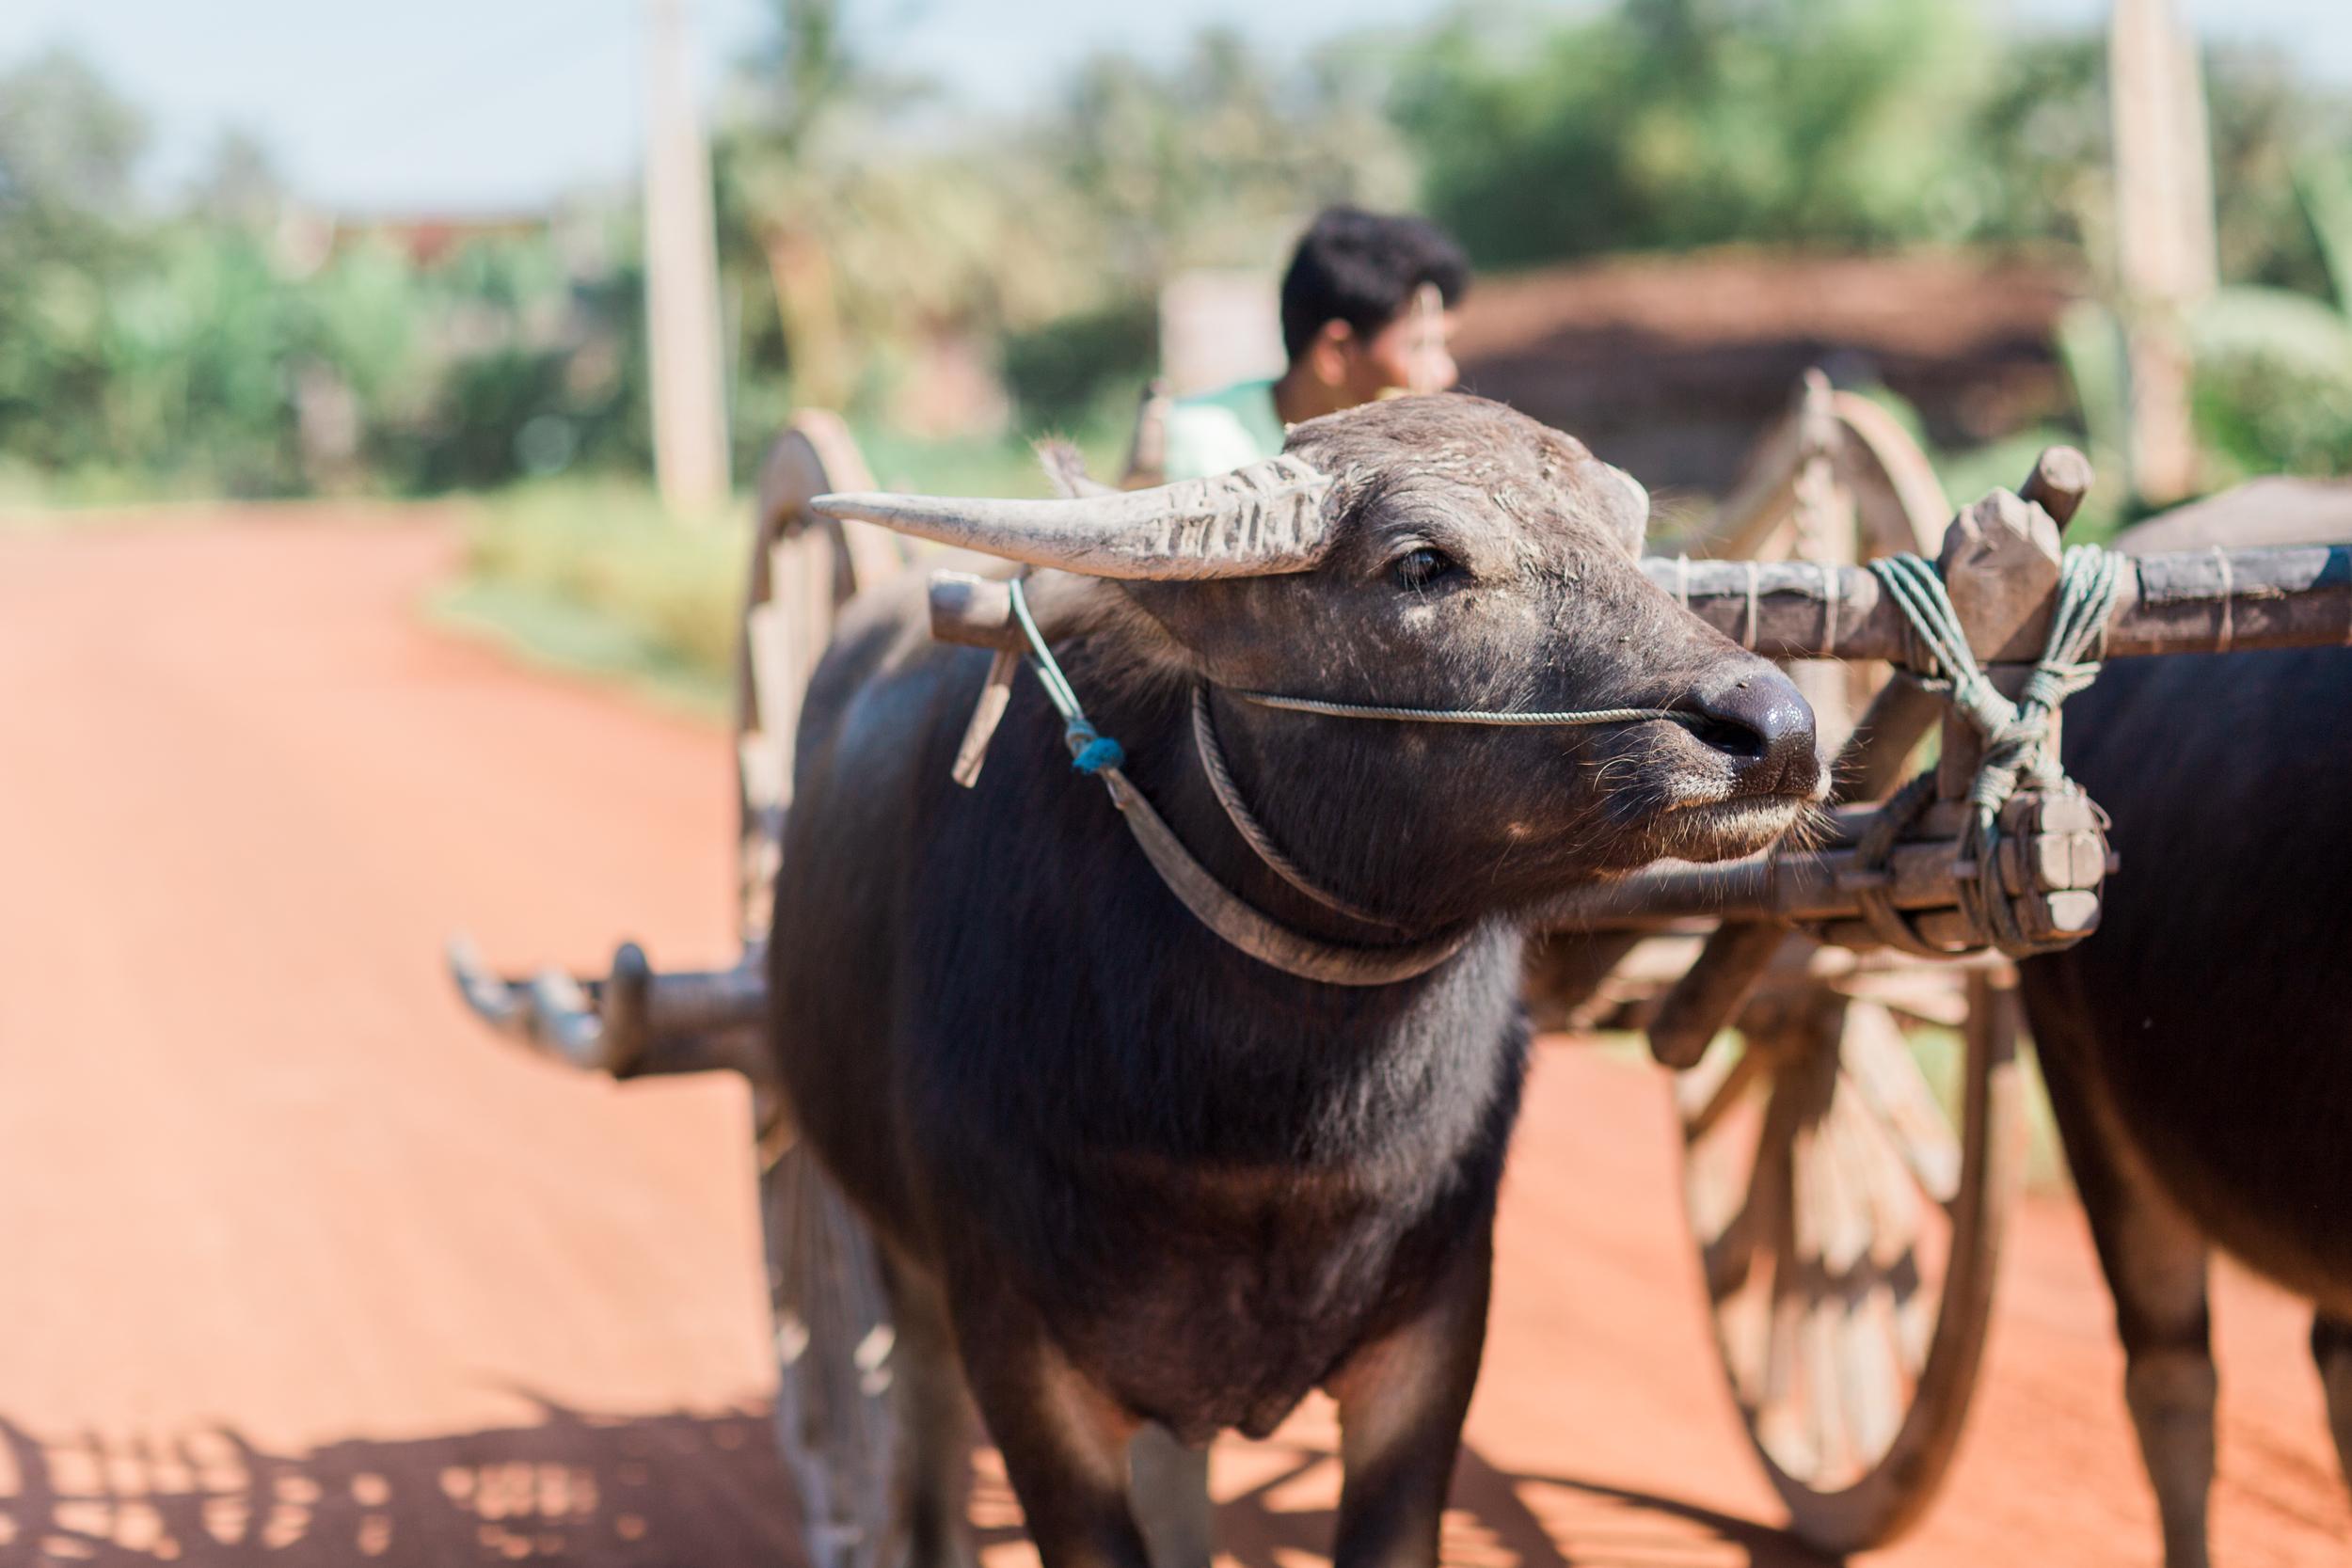 Cari Zhu Photography - Cambodia Siem Reap South East Asia Travel-1592.jpg